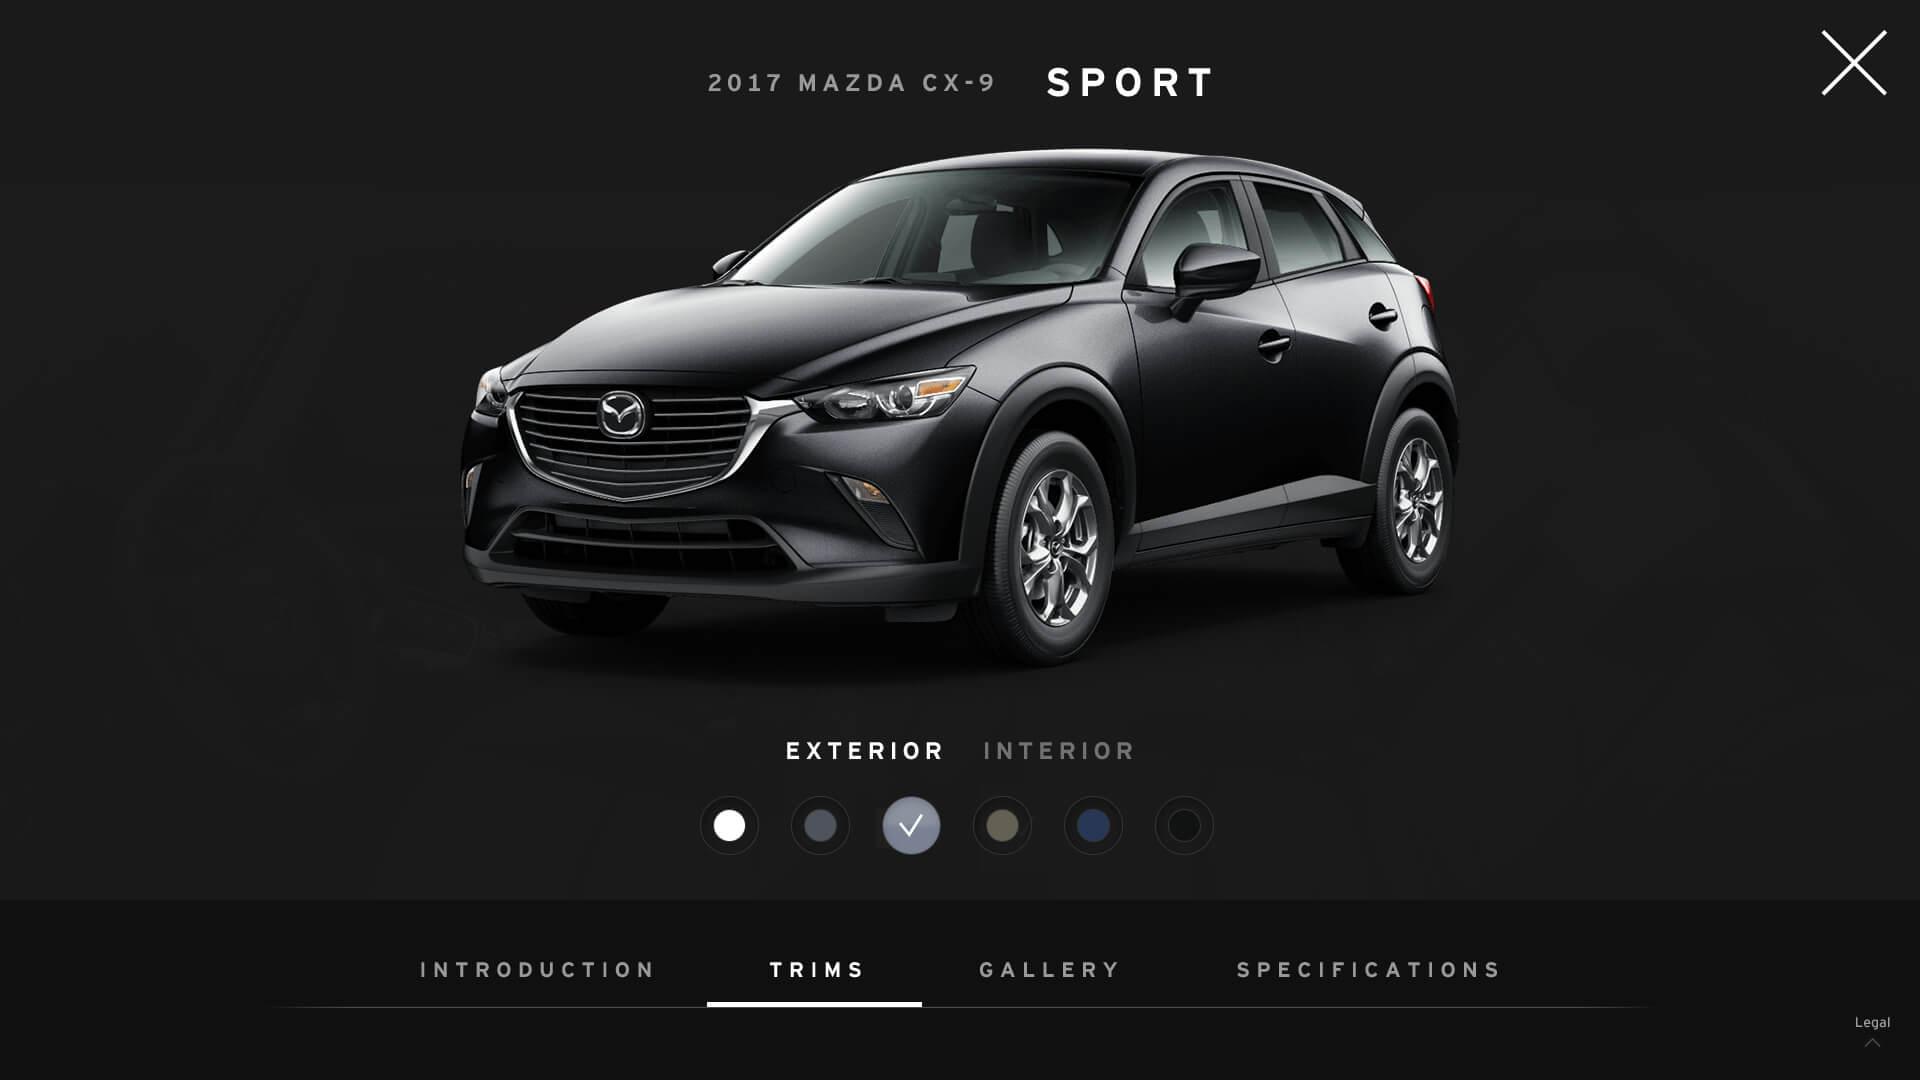 Mazda_wheelstand_2017_1920x1080_03_exterior